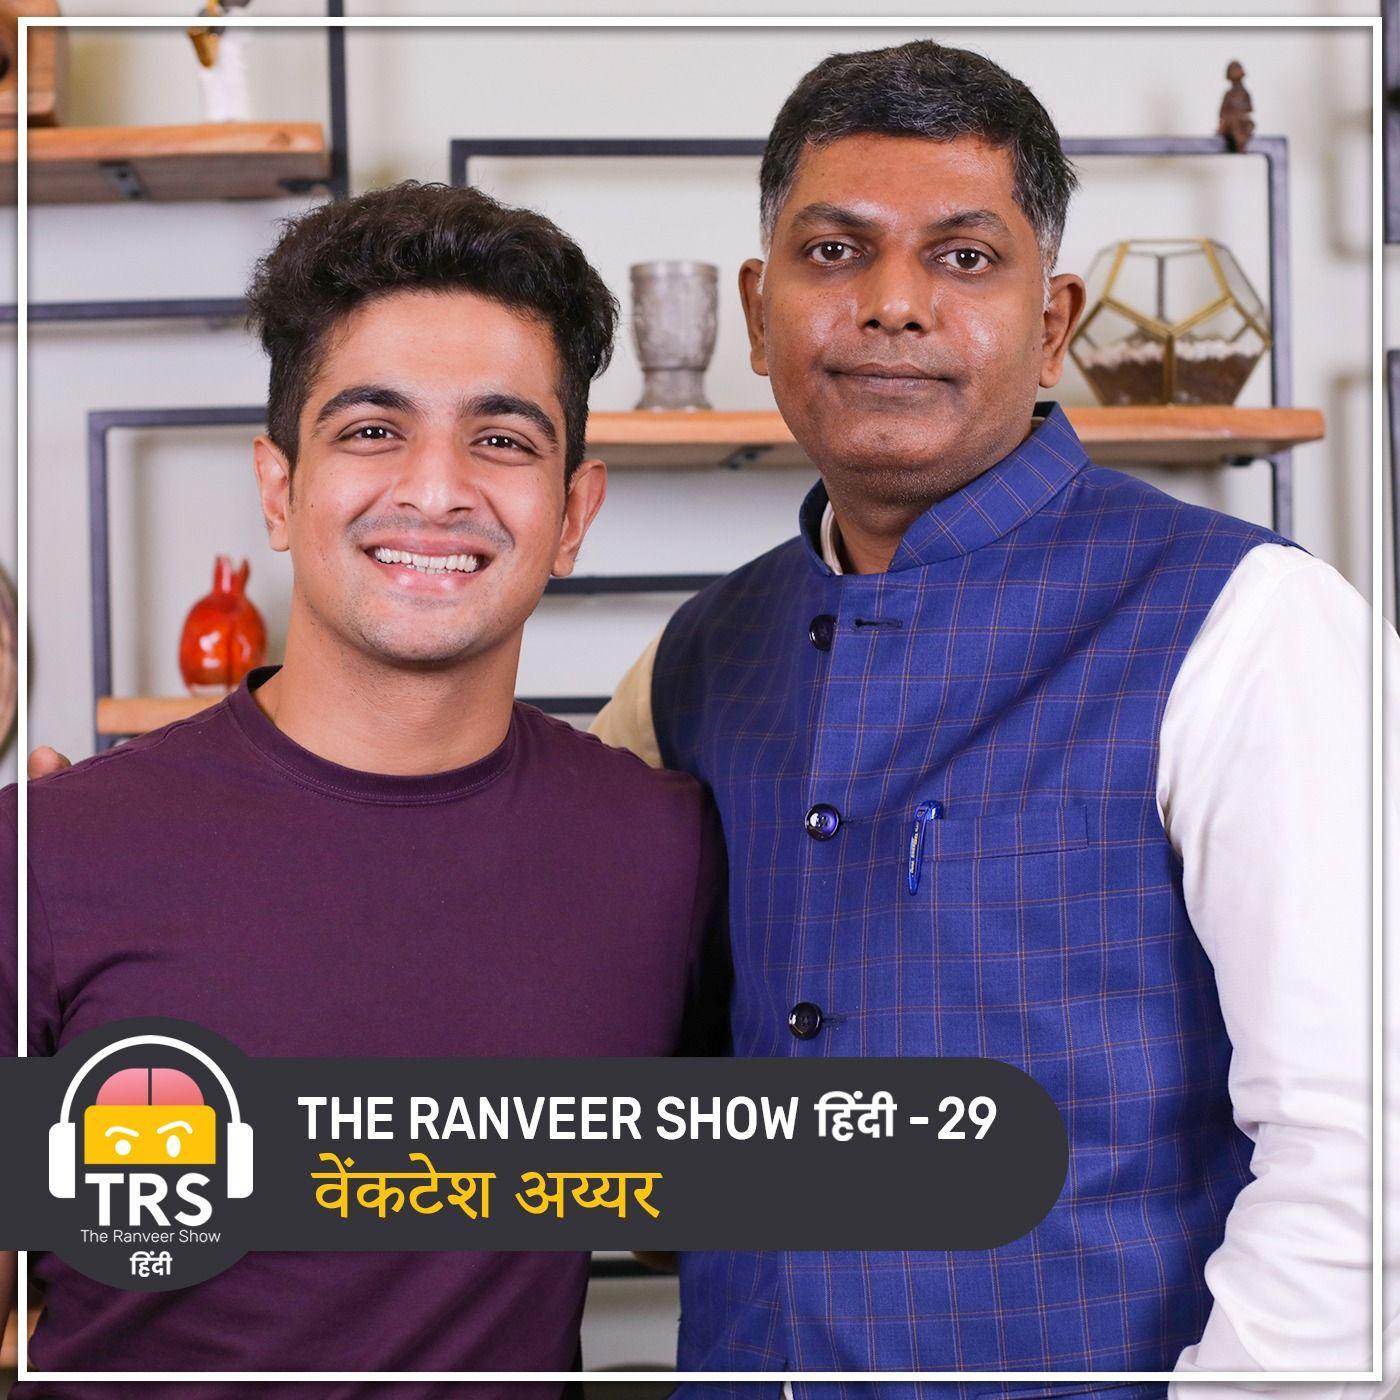 Successful Entrepreneur Banne Ke Liye Fail Hona Seekho | Venkatesh Iyer | The Ranveer Show हिंदी 29